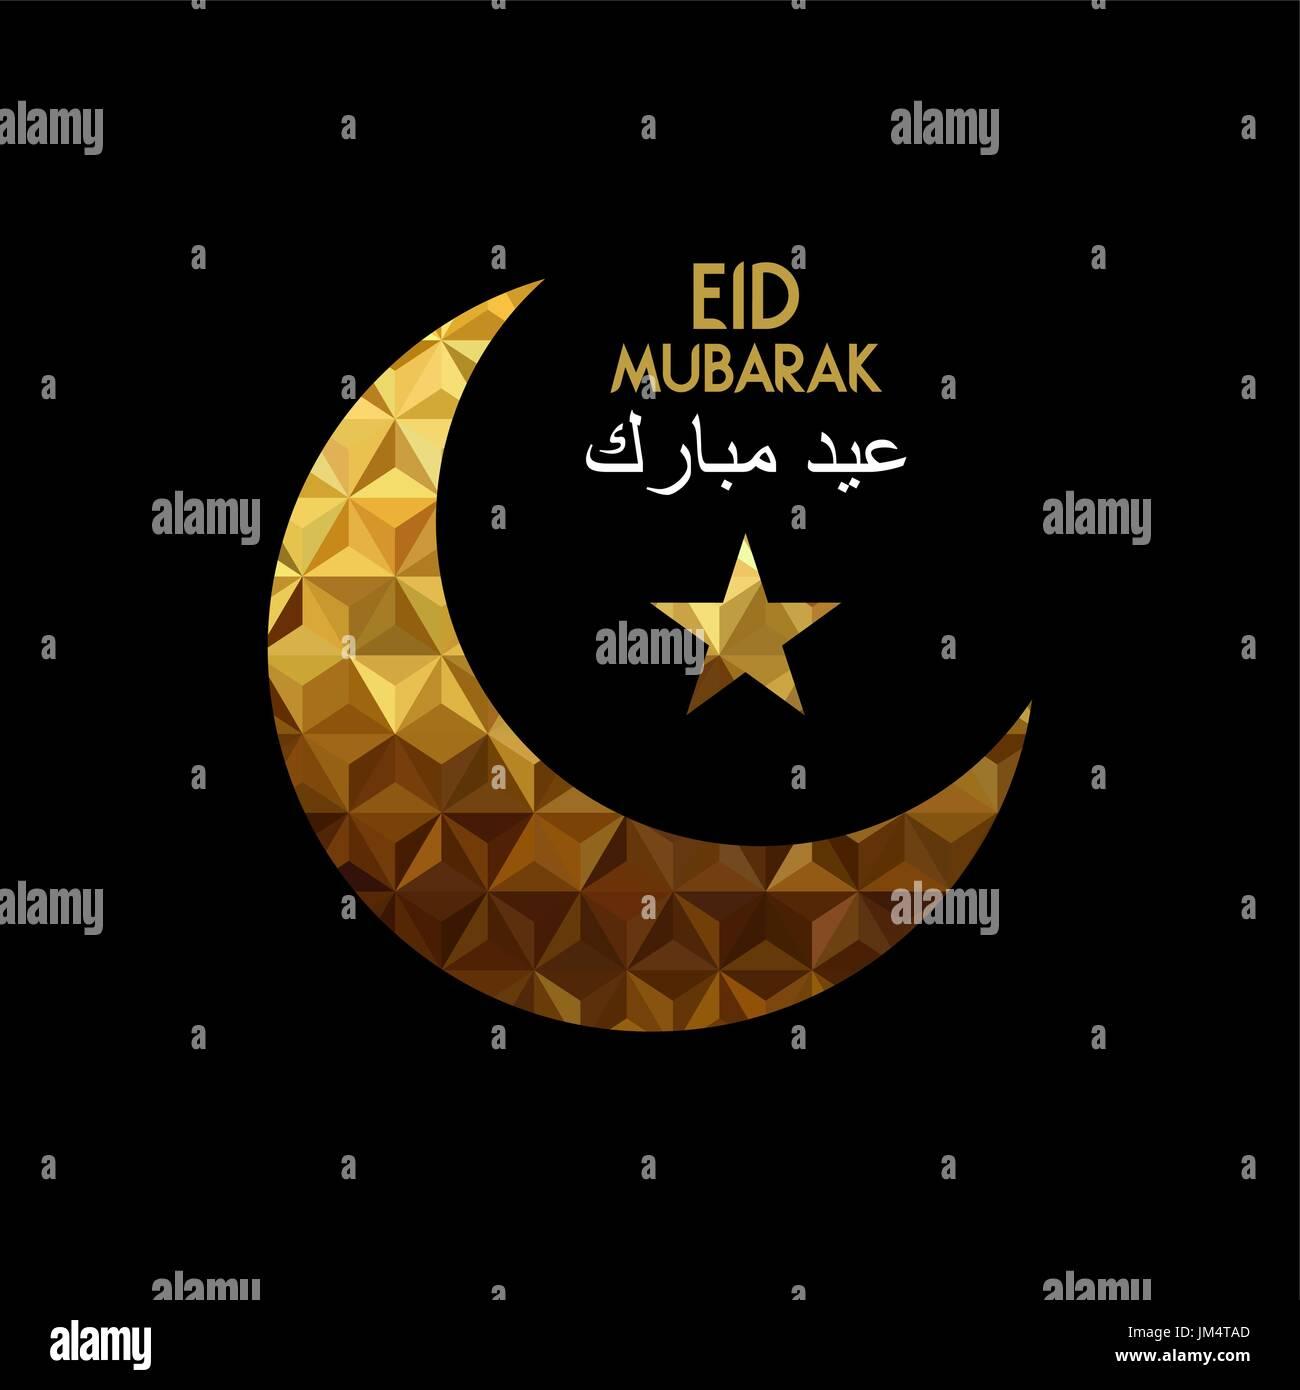 Eid Mubarak Greeting Card For Muslim Holiday Season Moon And Star